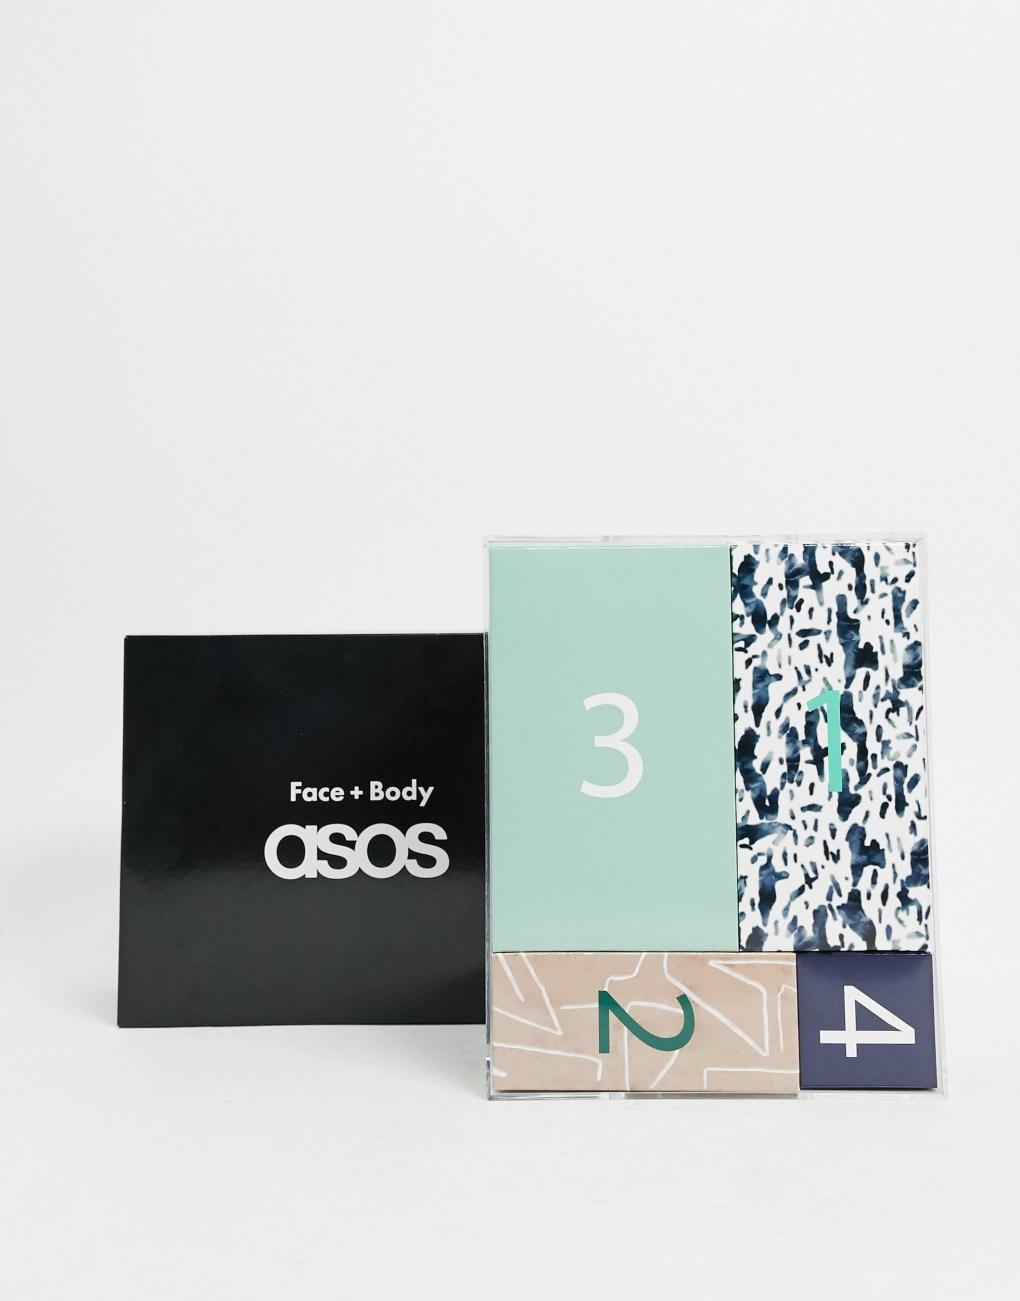 Calendario de adviento de 12 días con productos de belleza de ASOS